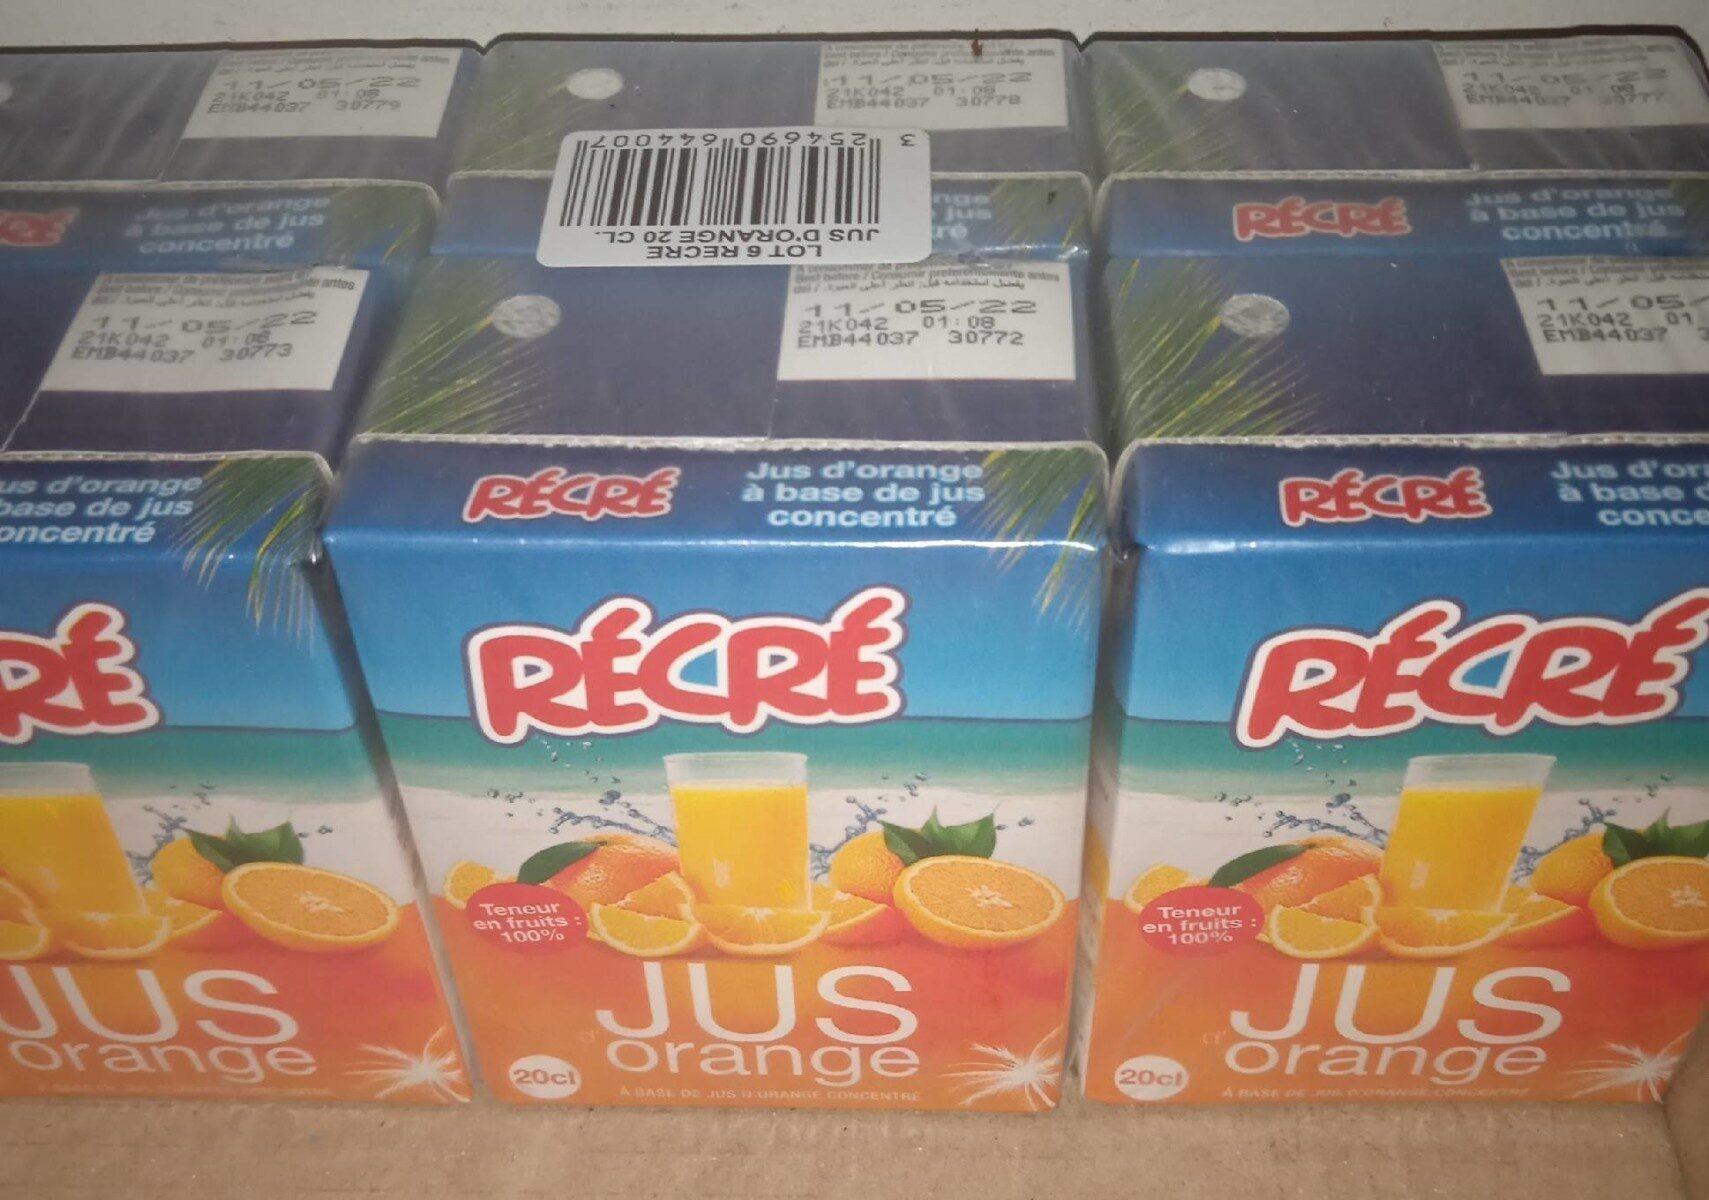 Lot 6 Recre 100% jus d'orange 20CL - Prodotto - fr